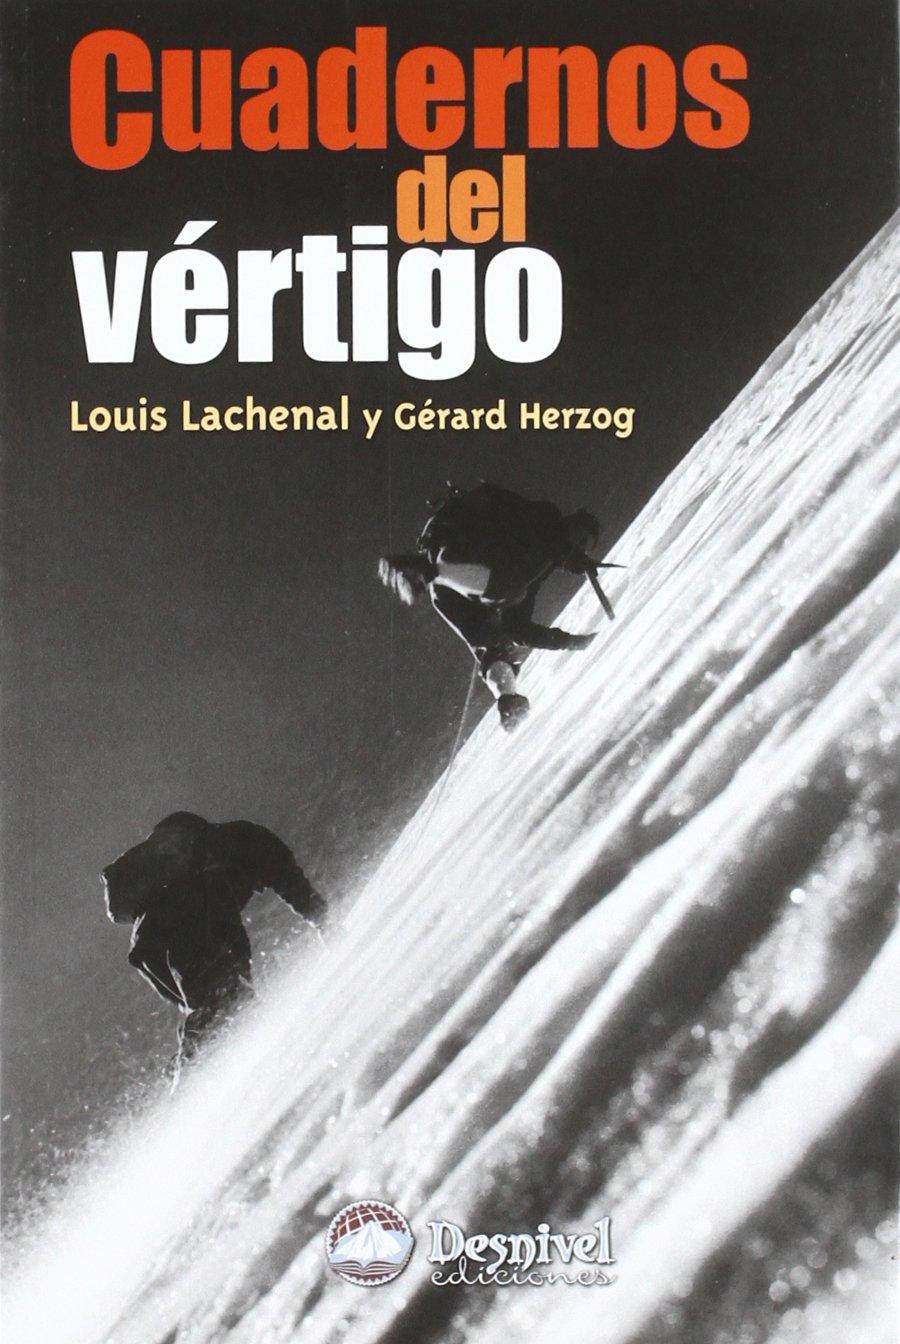 Cuadernos de vertigo